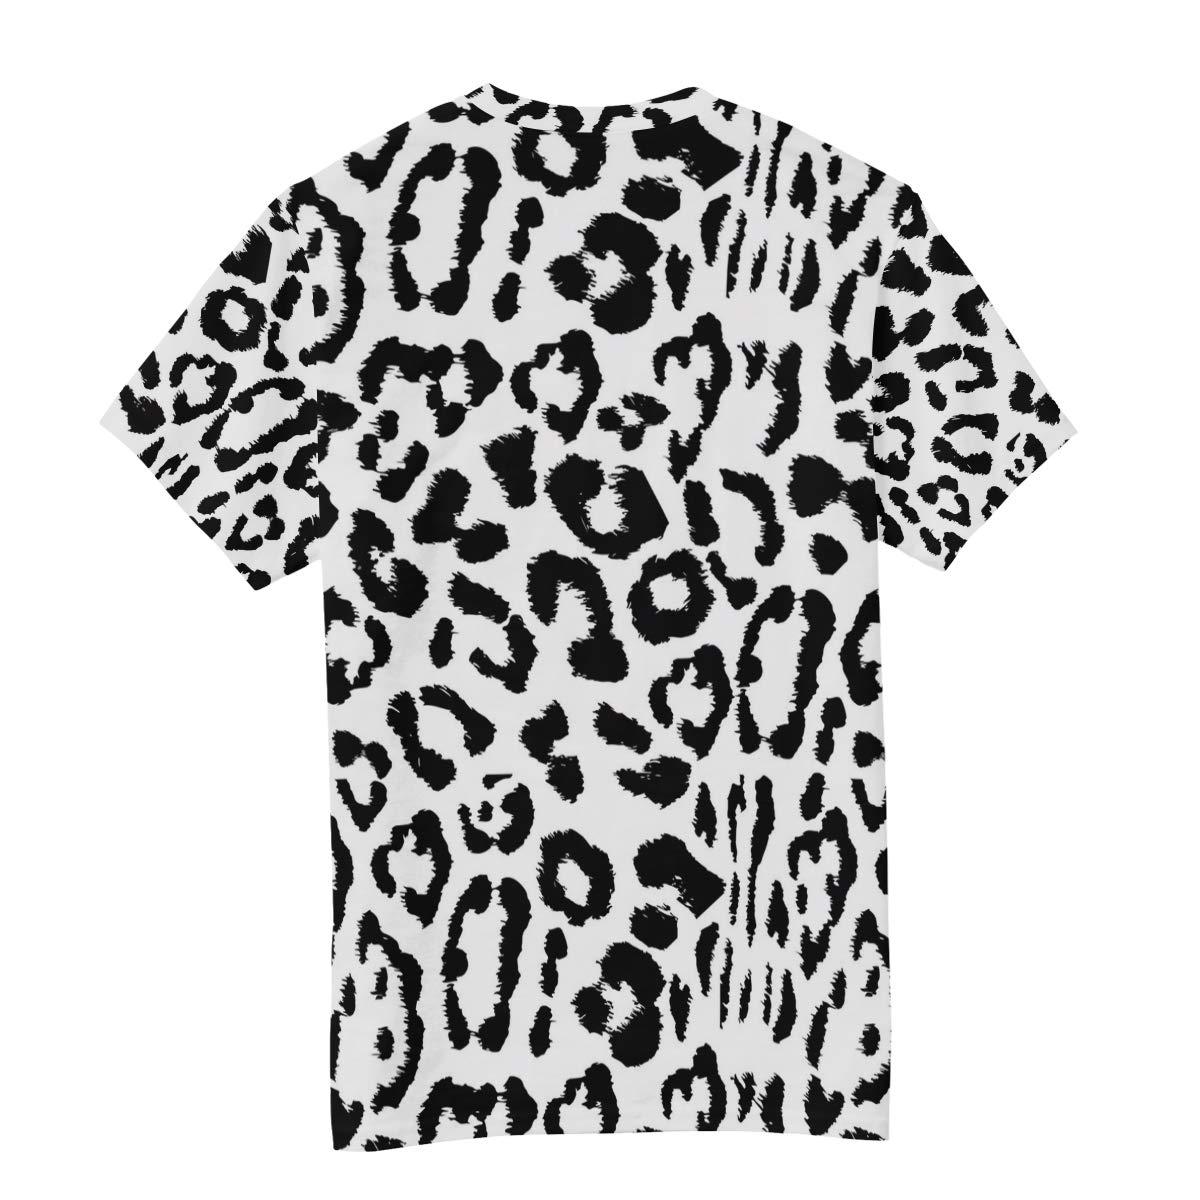 Horatiood Huberyyd Black Leopard Print Decor Mens T Shirts Graphic Funny Body Print Short T-Shirt Unisex Pullover Blouse